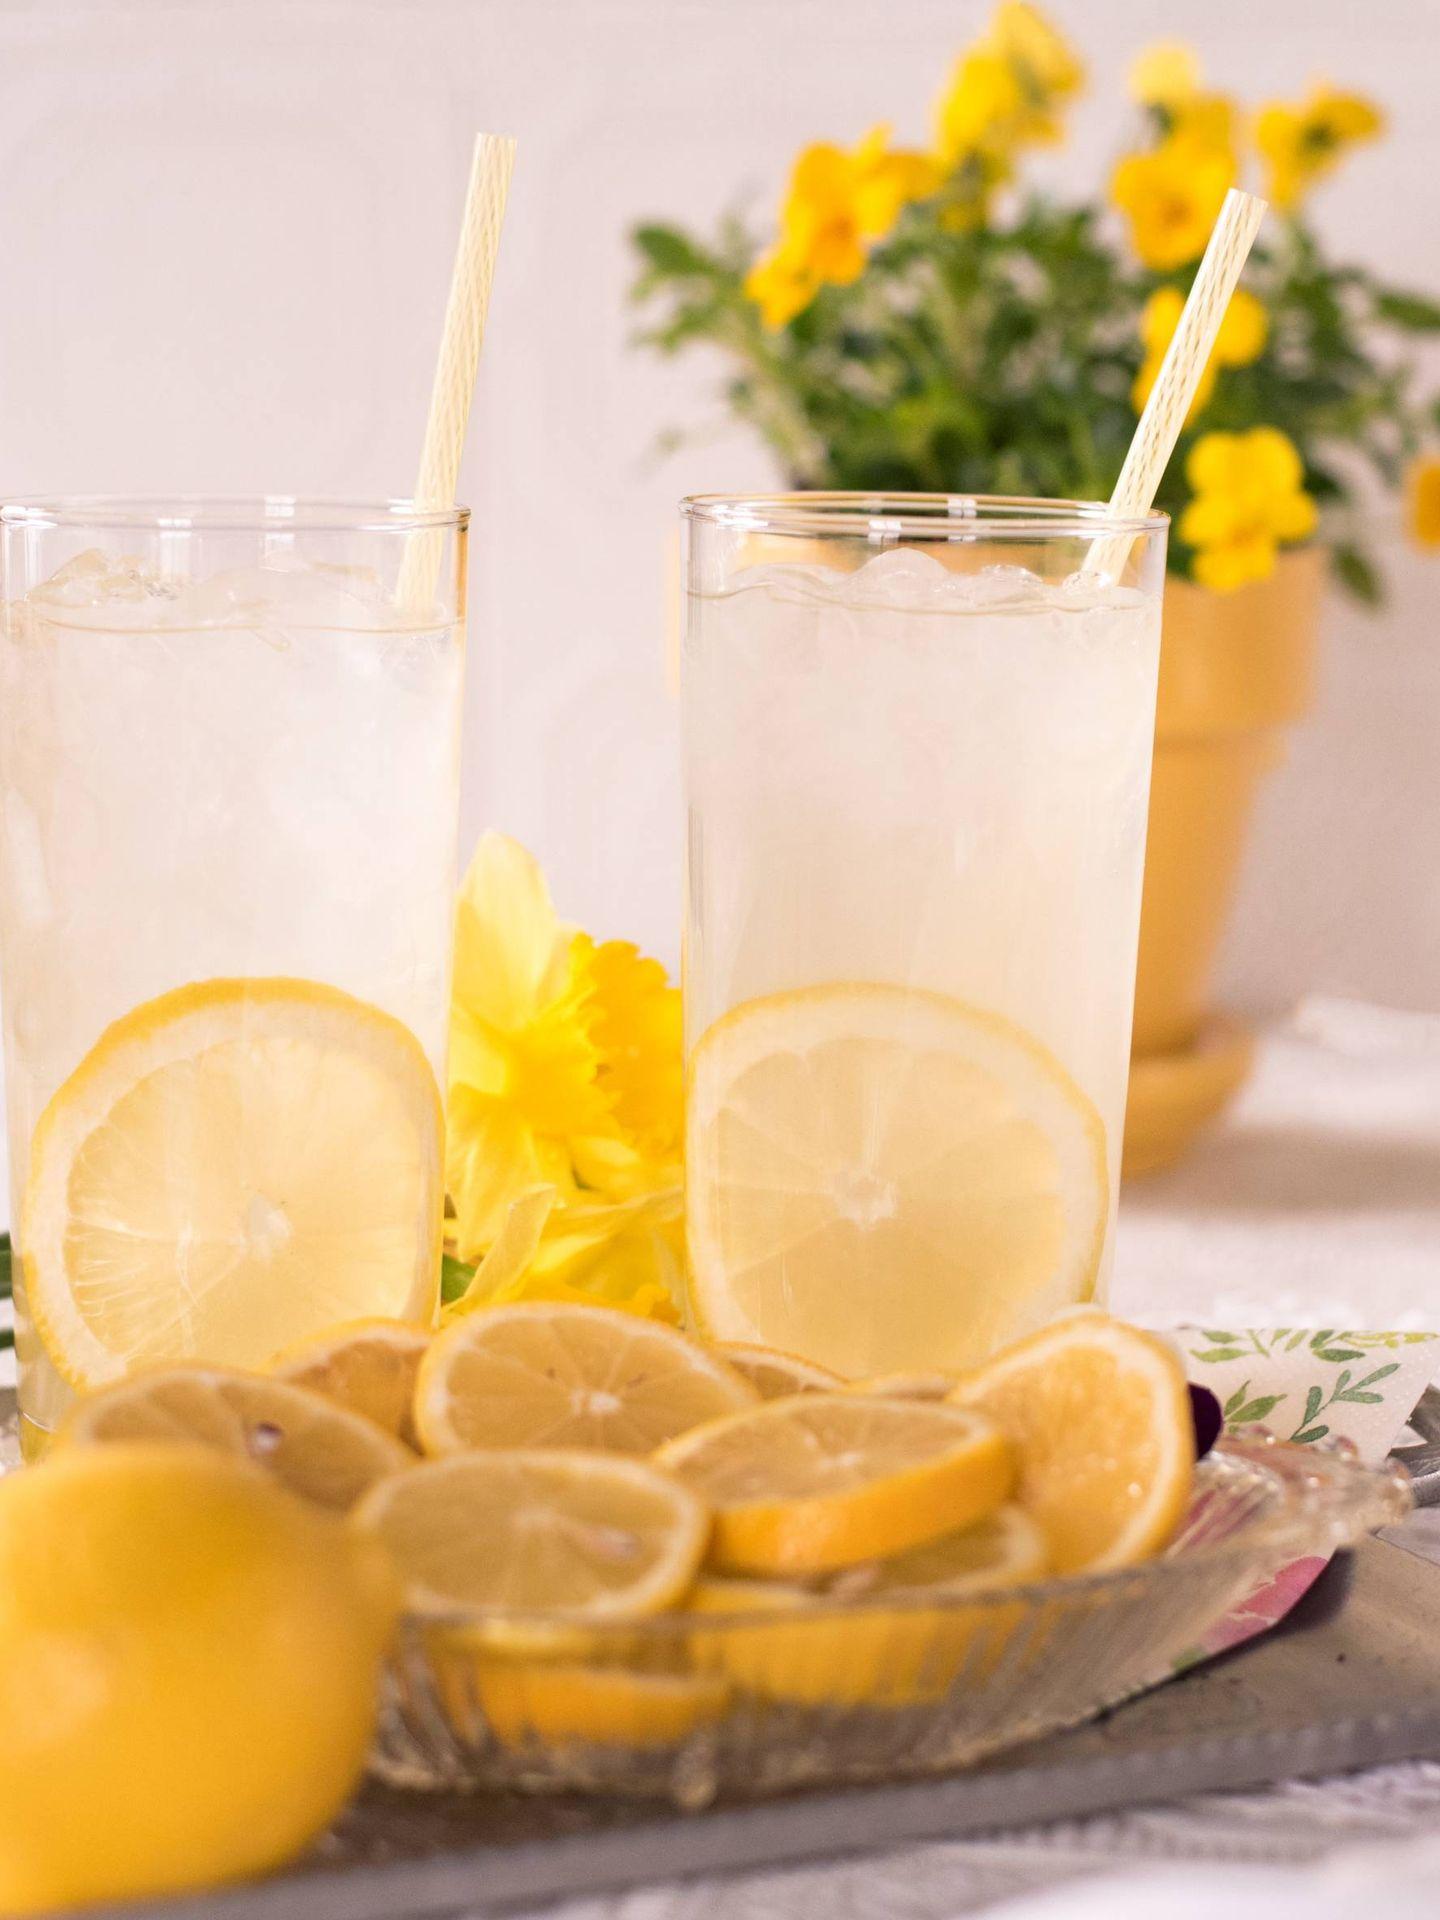 La limonada es la base de la dieta de la dieta del limón. (Charity Beth Long para Unsplash)